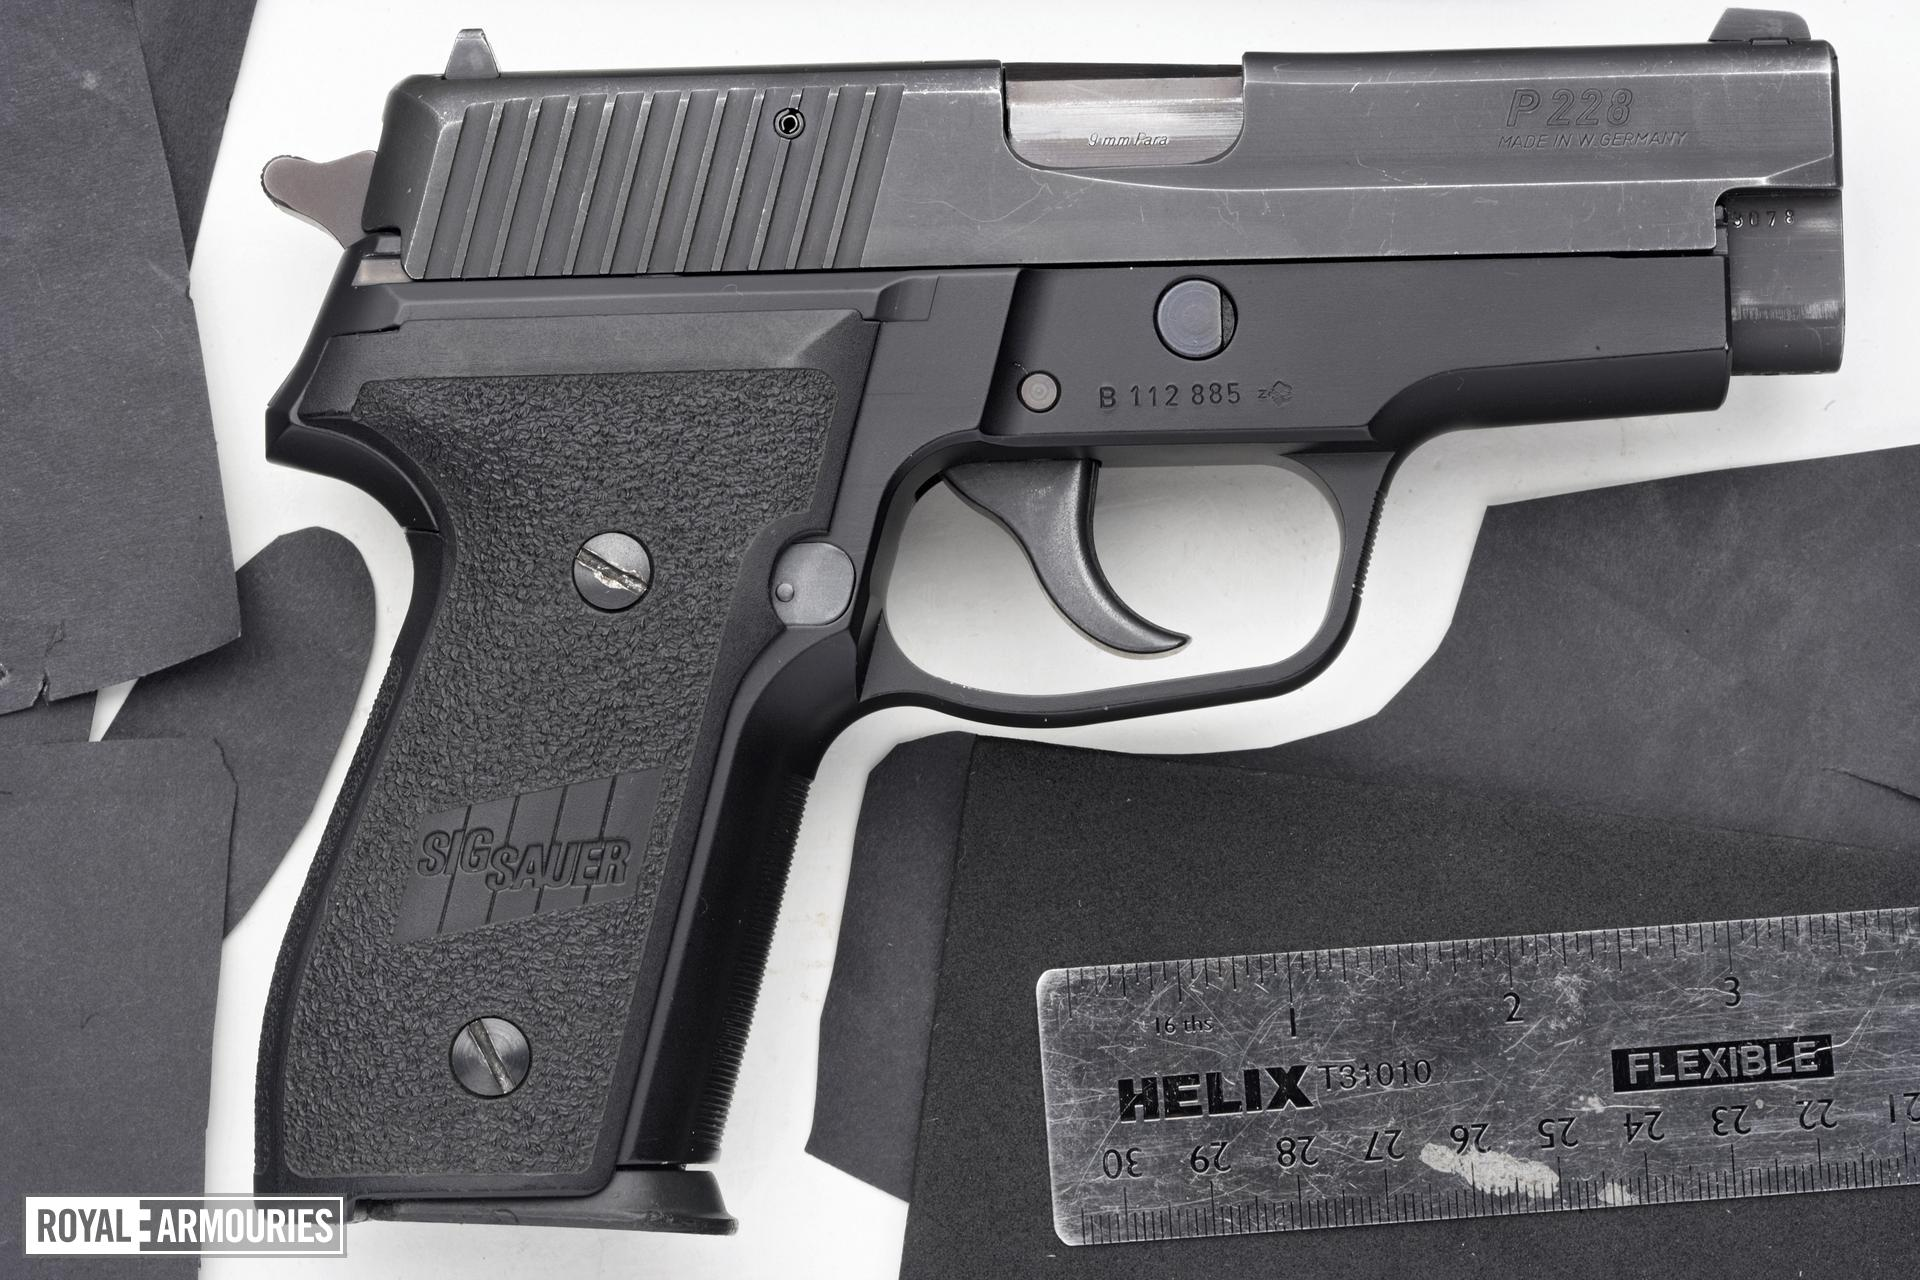 Centrefire self-loading pistol - SIG Sauer P228